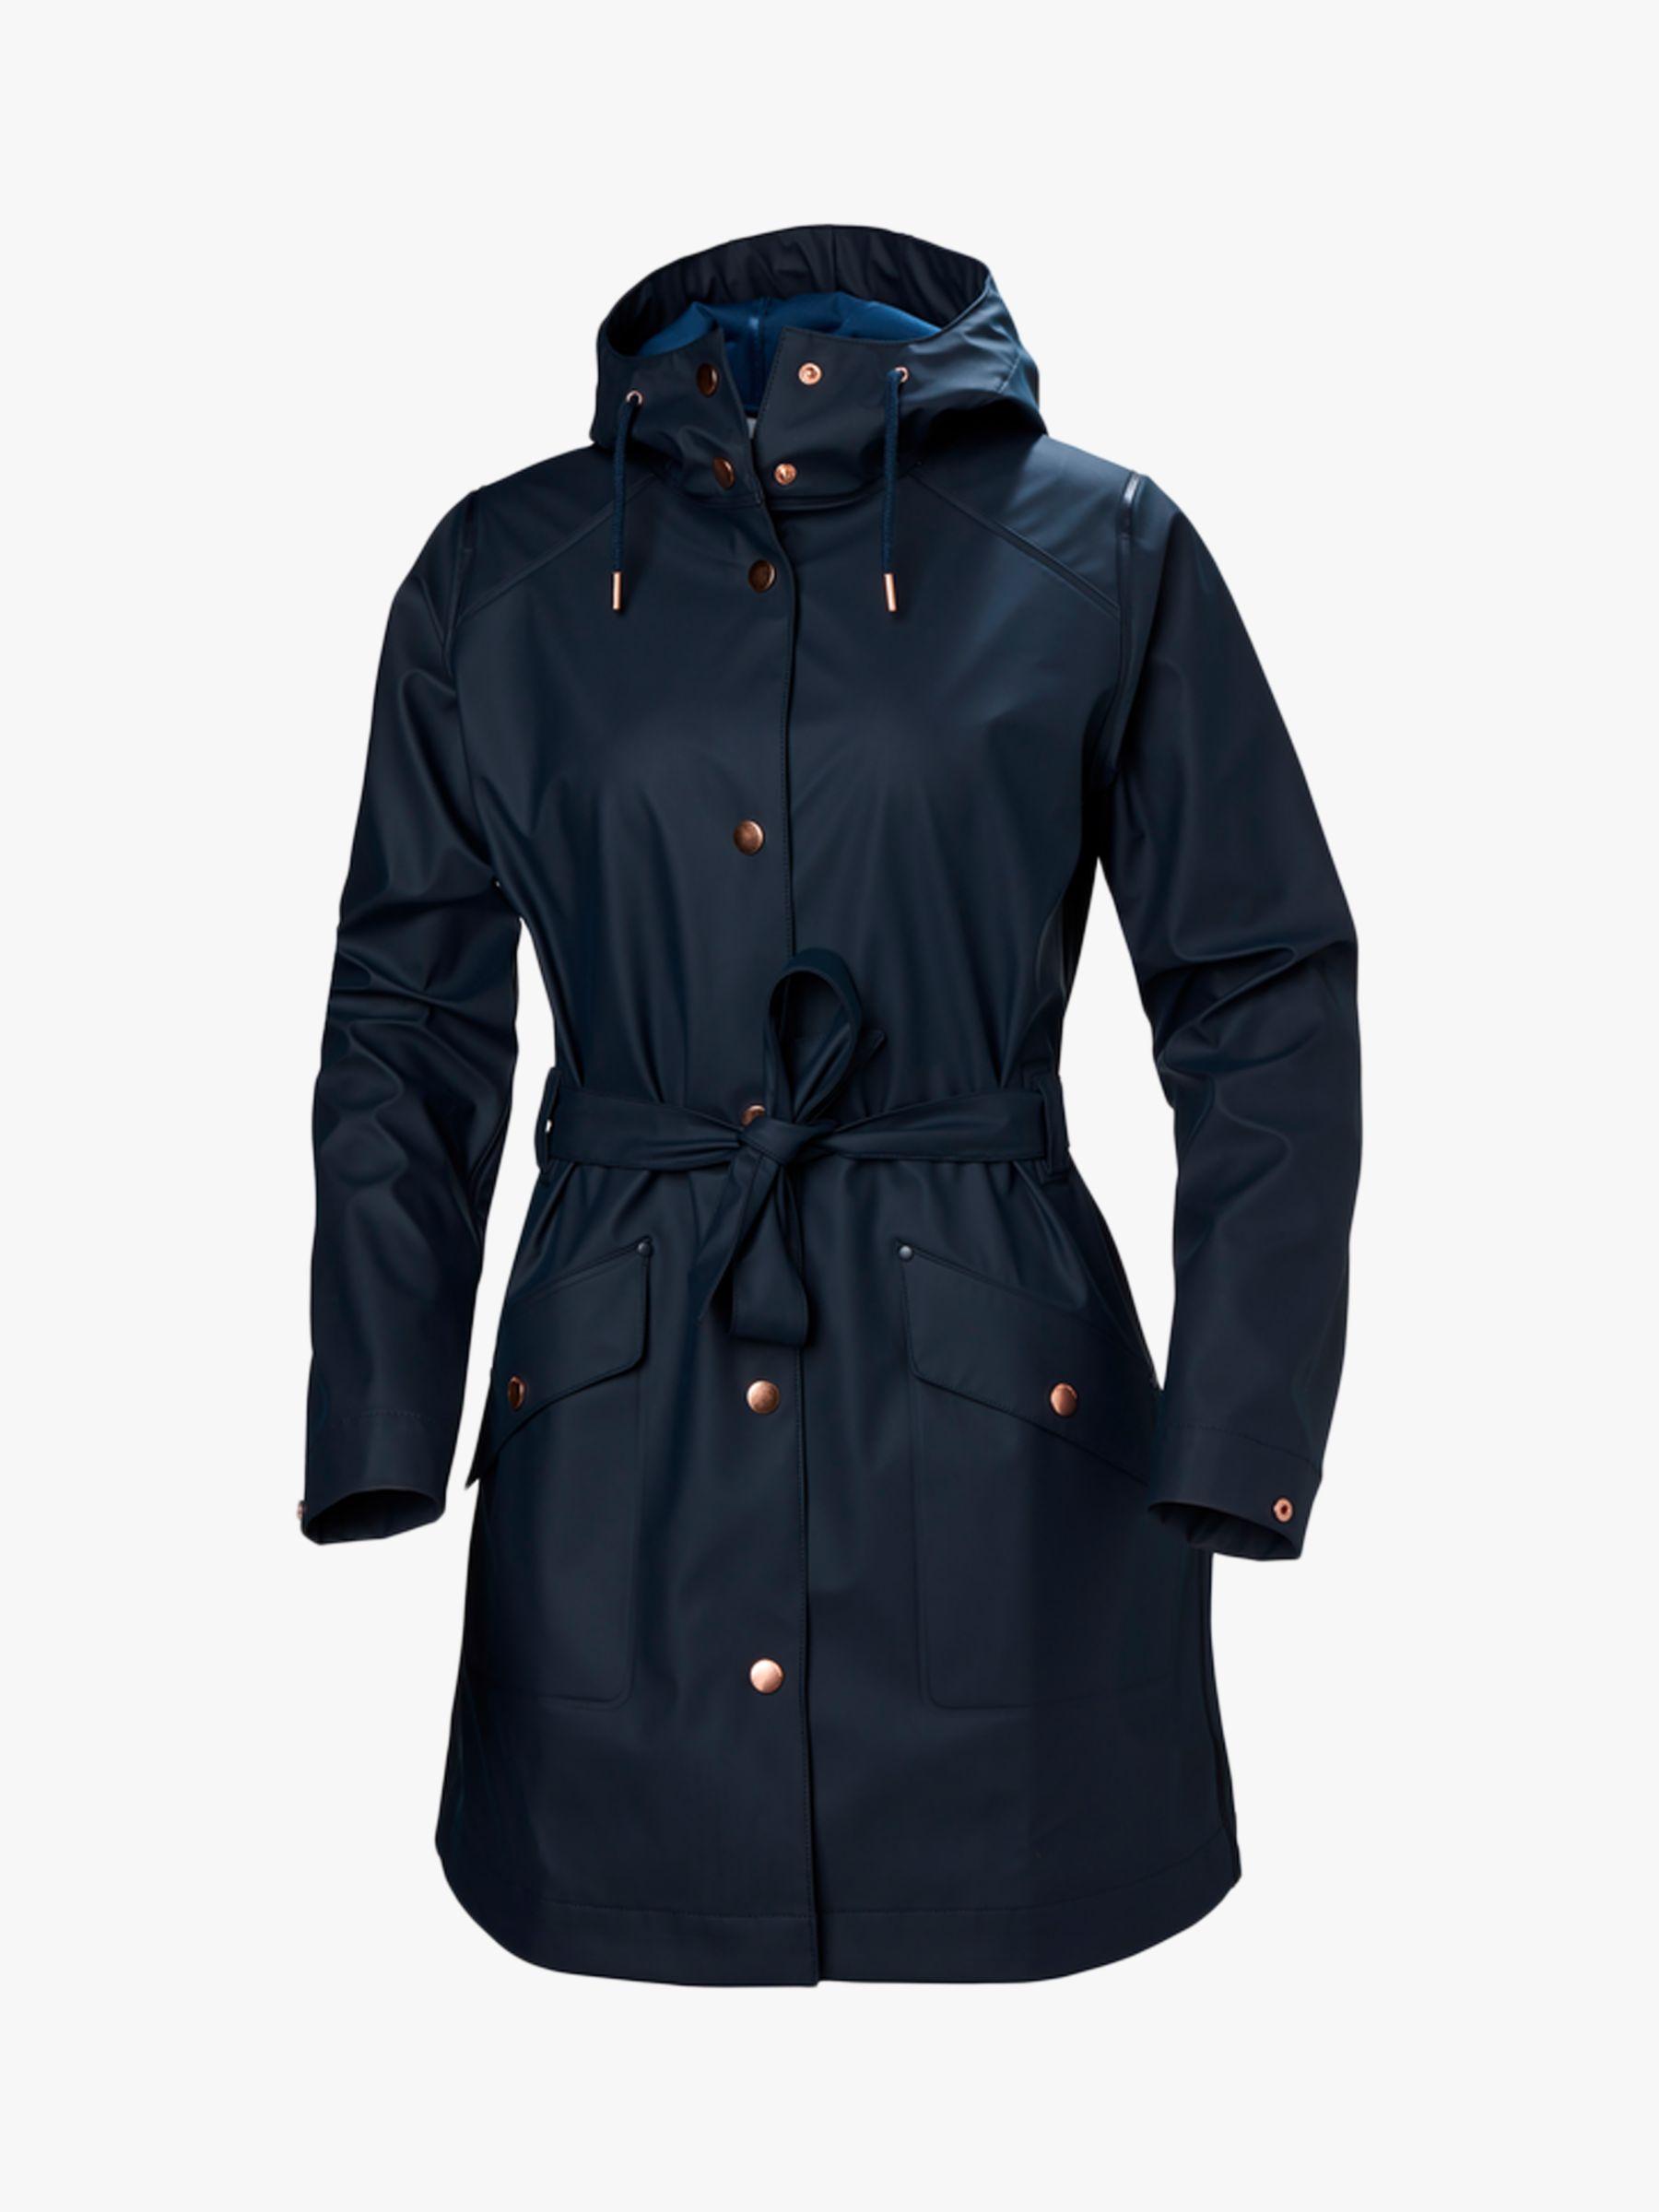 Helly Hansen Helly Hansen Kirkwall II Women's Waterproof Raincoat